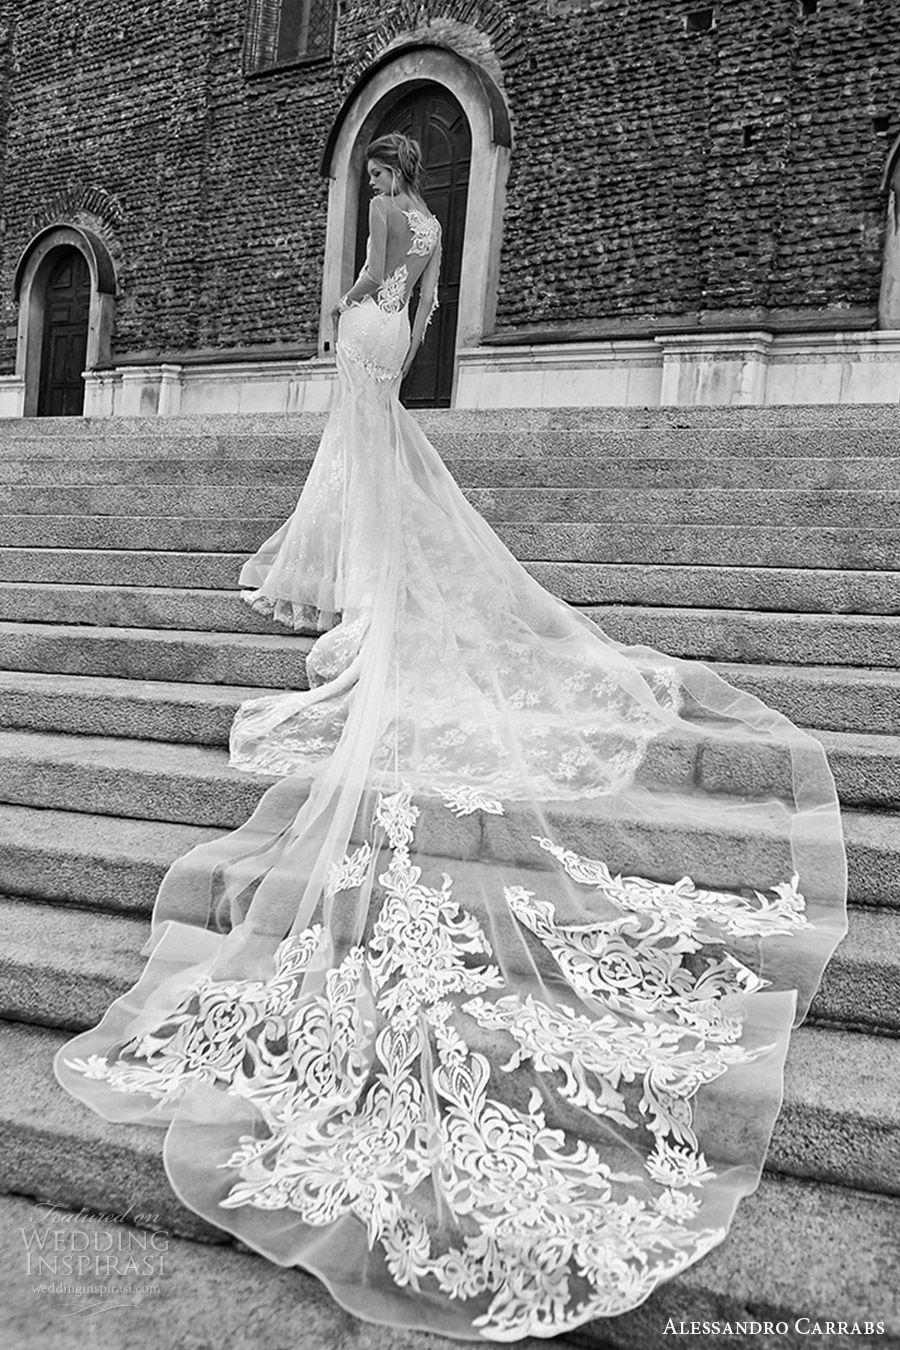 alessandro carrabs couture bridal 2016 illusion long sleeves sweetheart illusion bateau neck sheath mermaid lace wedding dress (002) bv overskirt crin long train